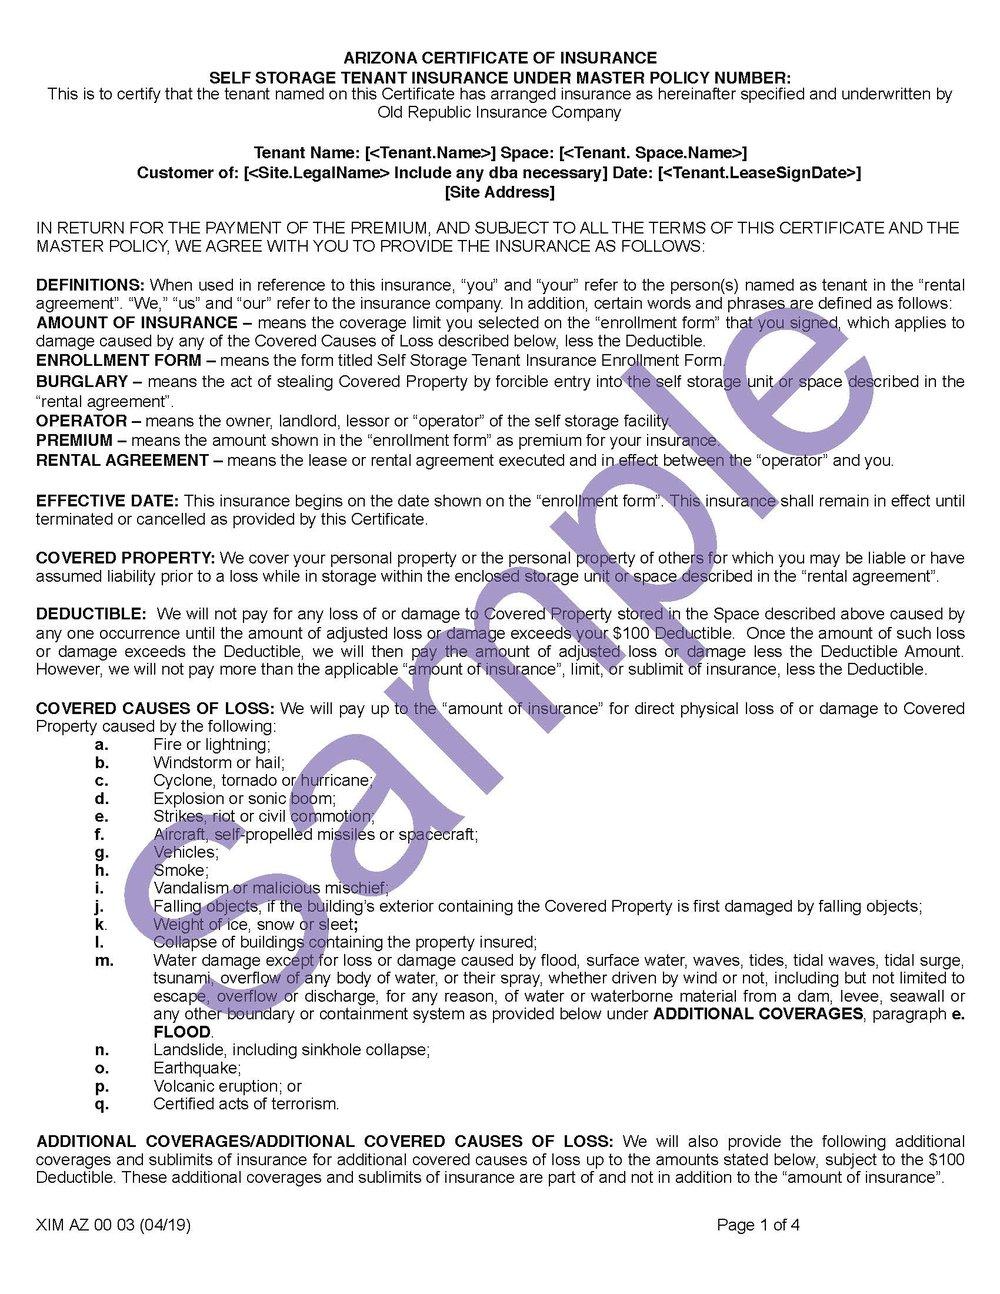 XIM AZ 00 03 04 19 Arizona Certificate of Insurance_Page_1.jpg